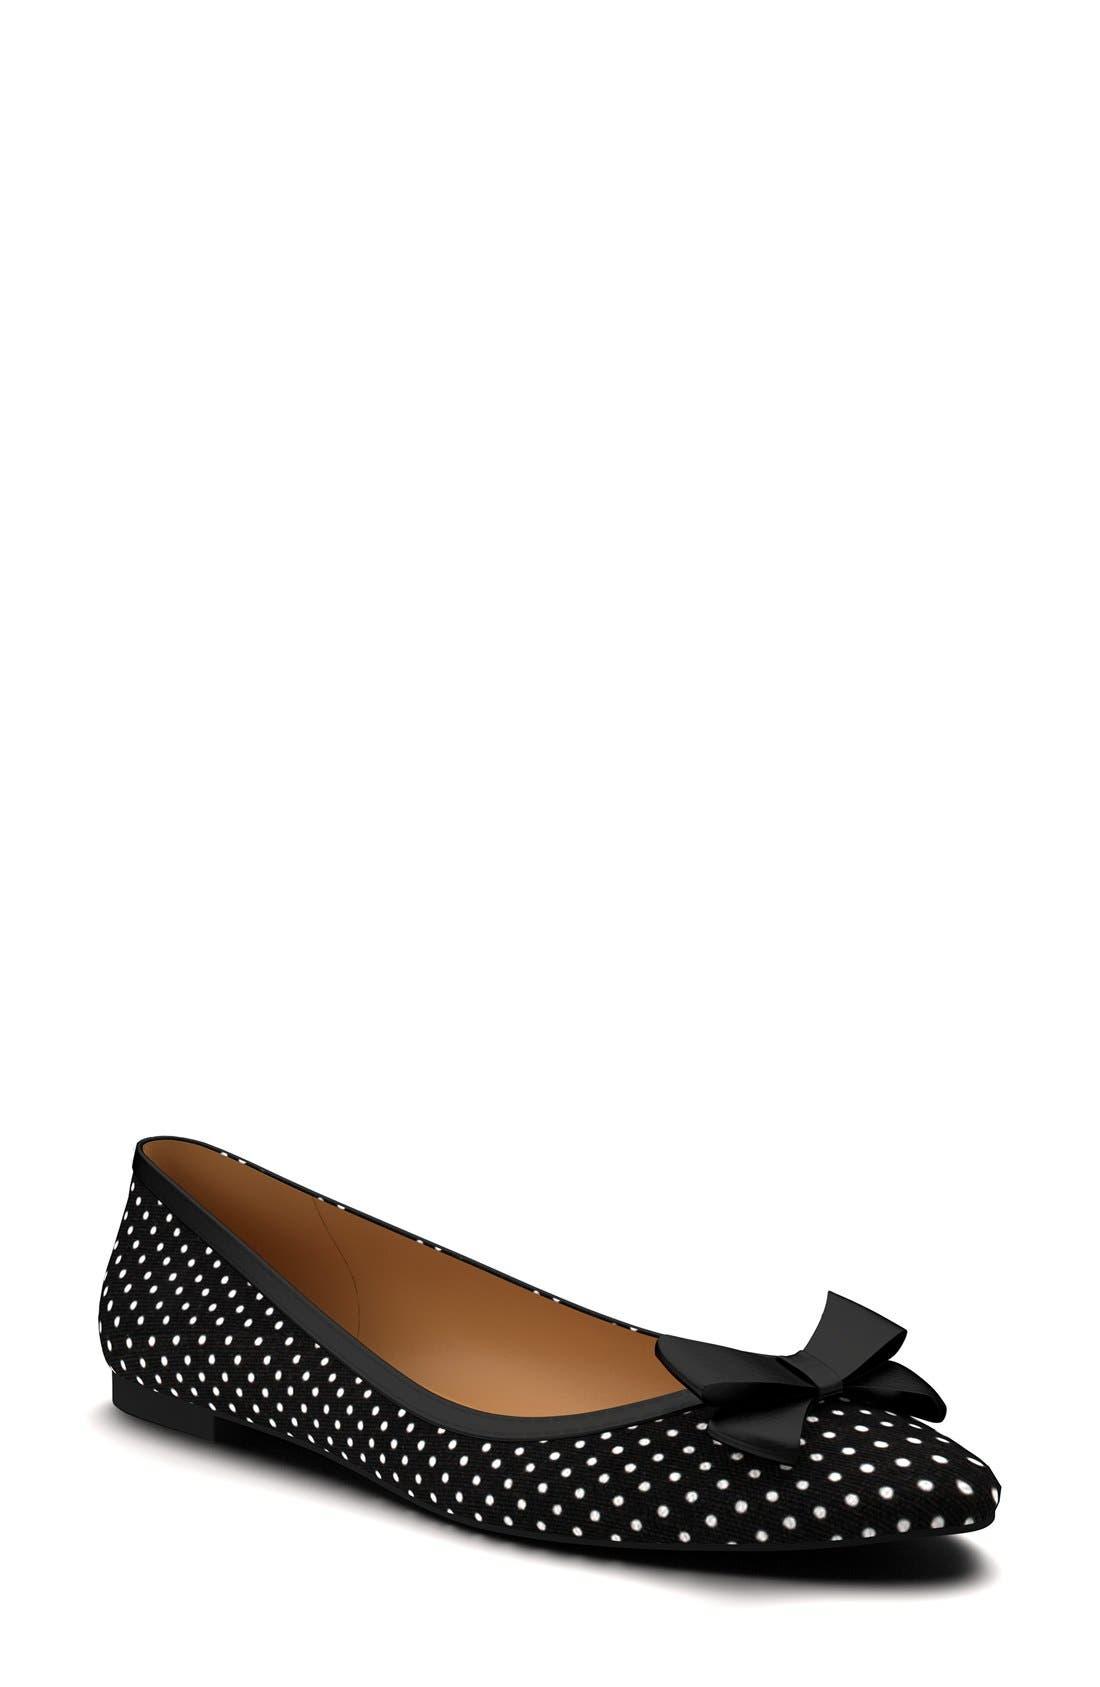 Alternate Image 1 Selected - Shoes of Prey Polka Dot Ballet Flat (Women)